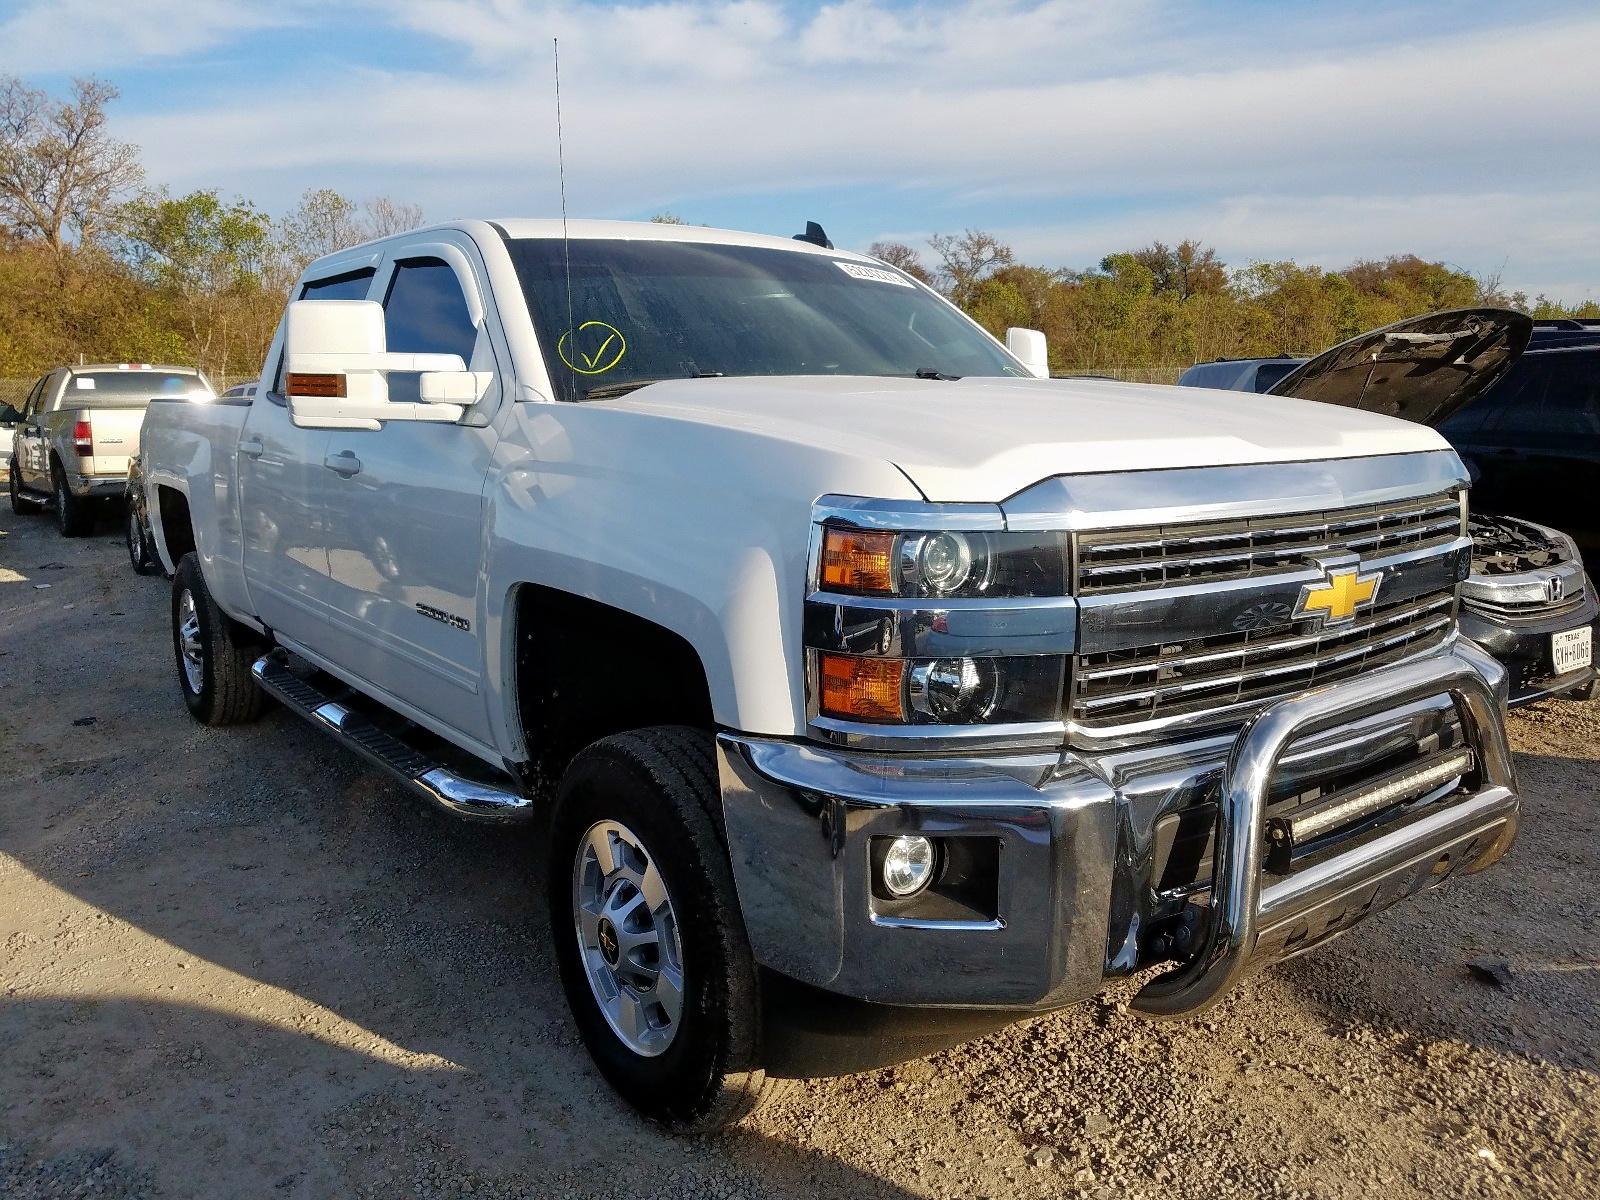 1GC1CVEG1GF279626 - 2016 Chevrolet Silverado 6.0L Left View